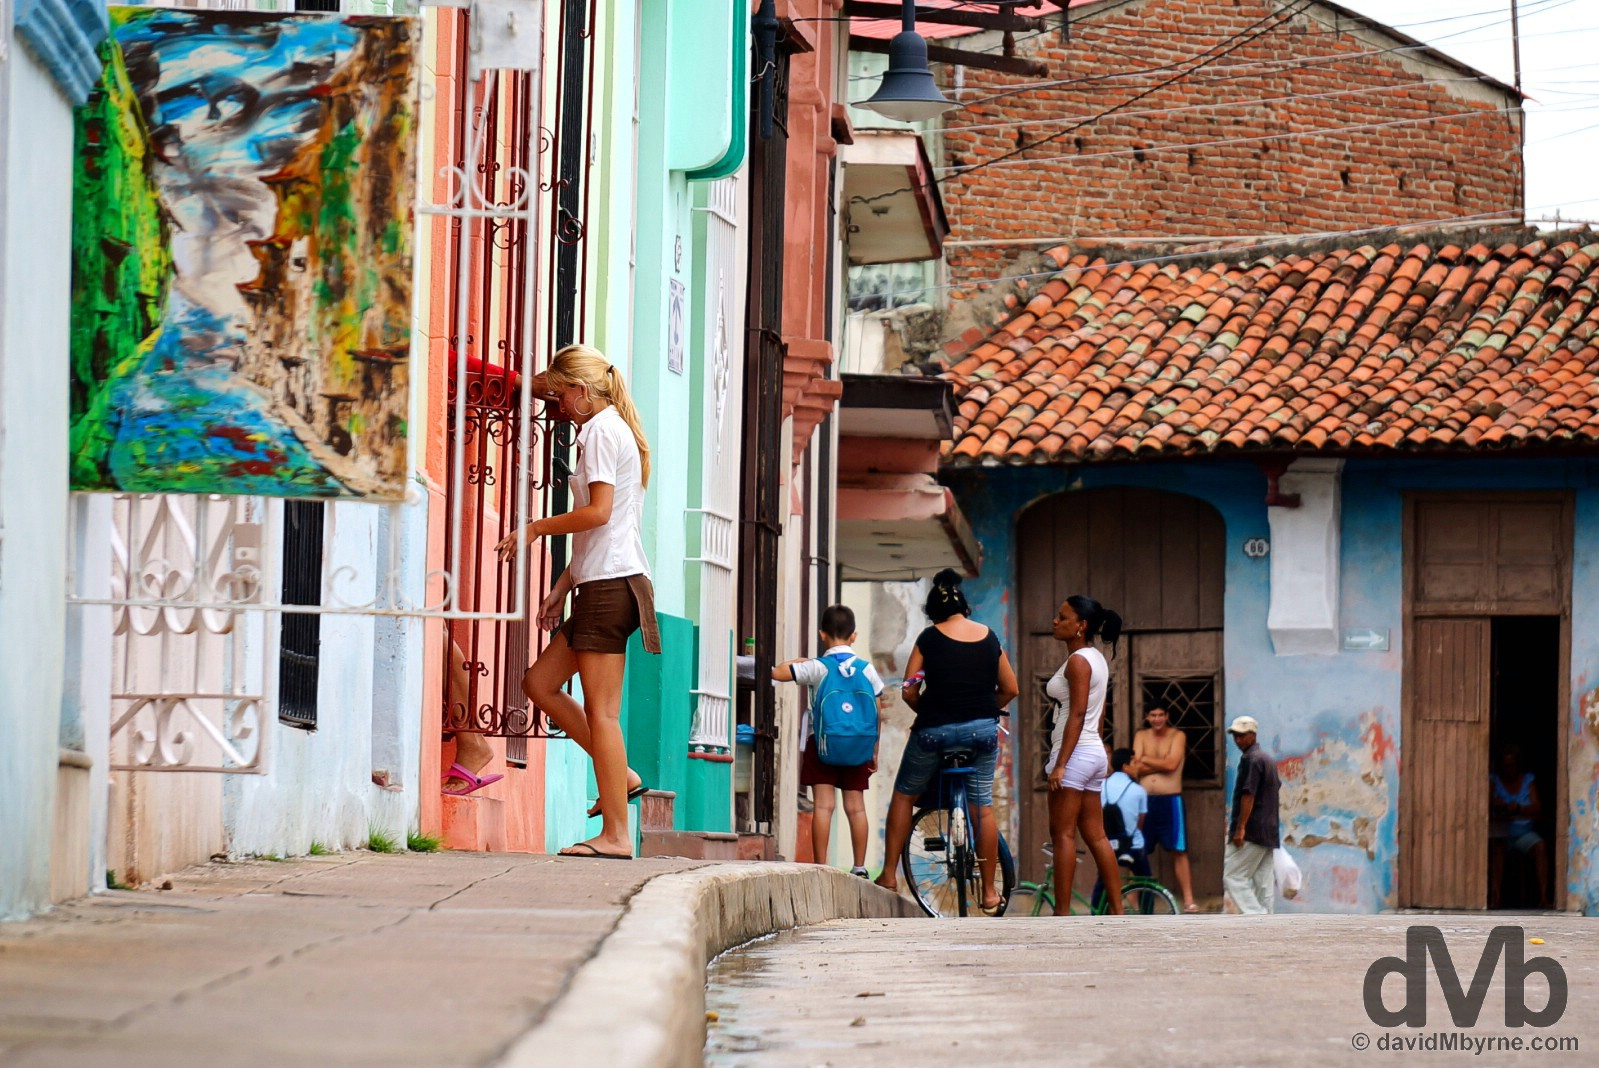 Camaguey, Cuba. May 4, 2015.